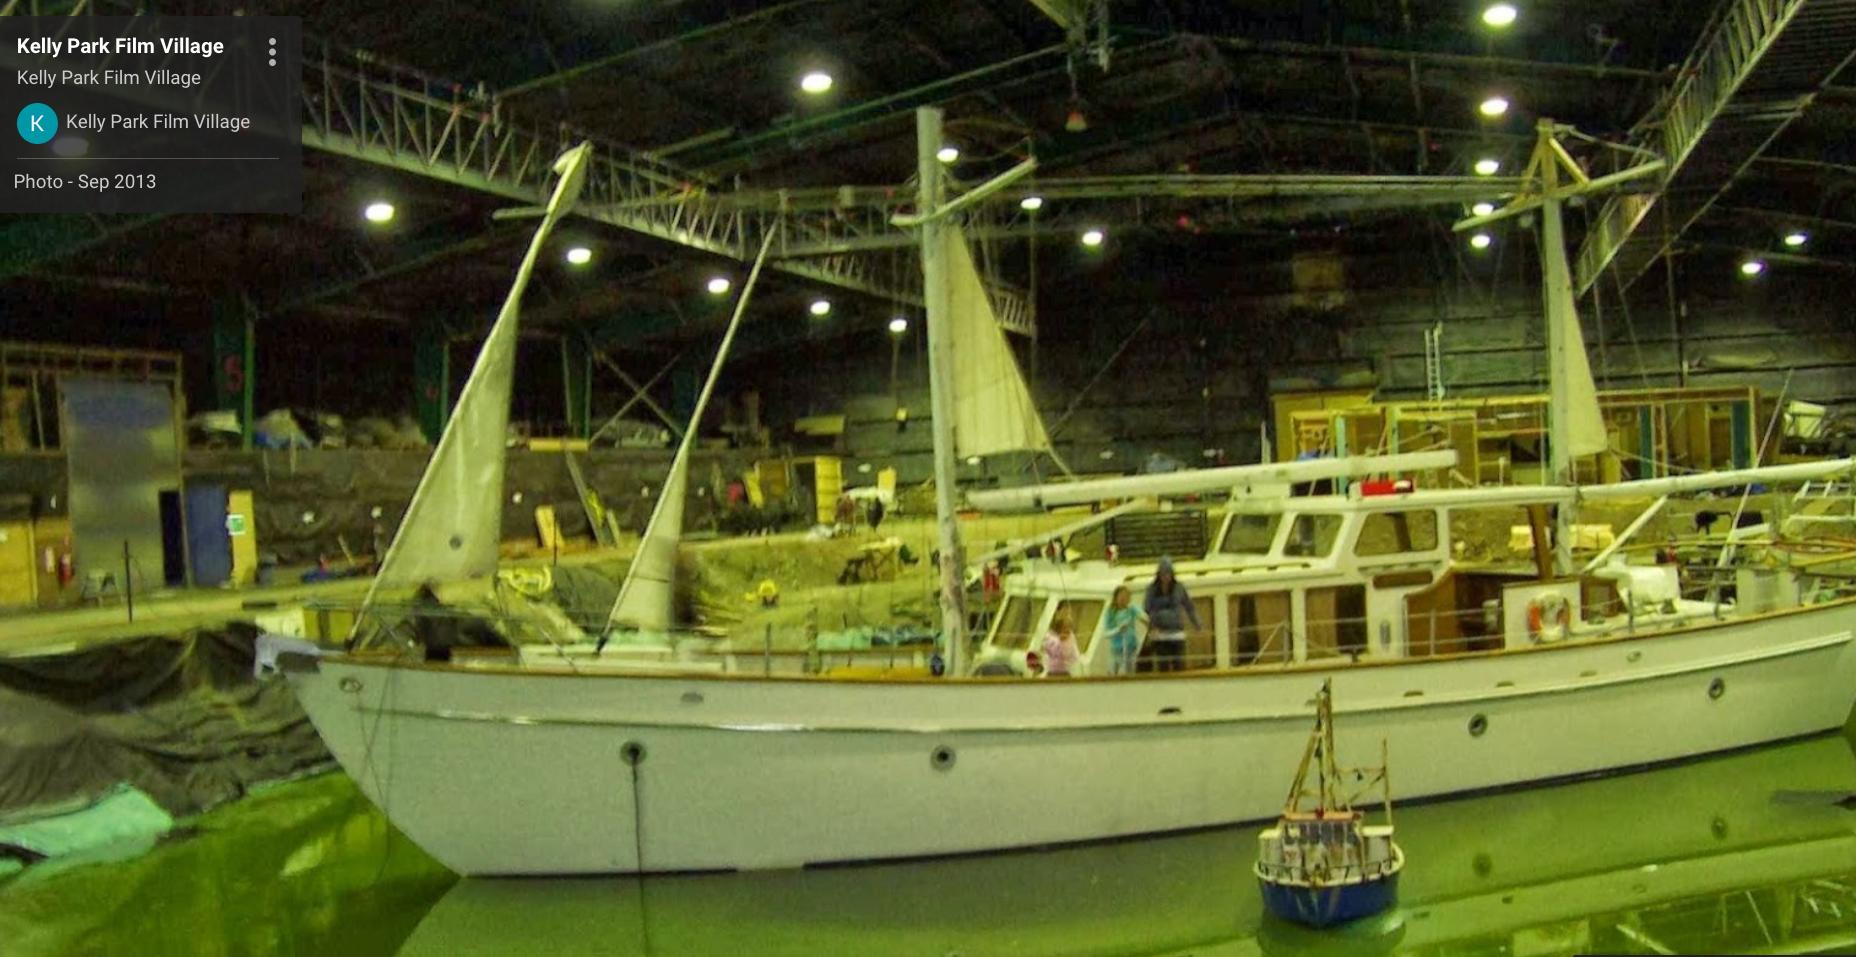 Studio floor excavated to create pool for boat scene -   FILM TRAILER